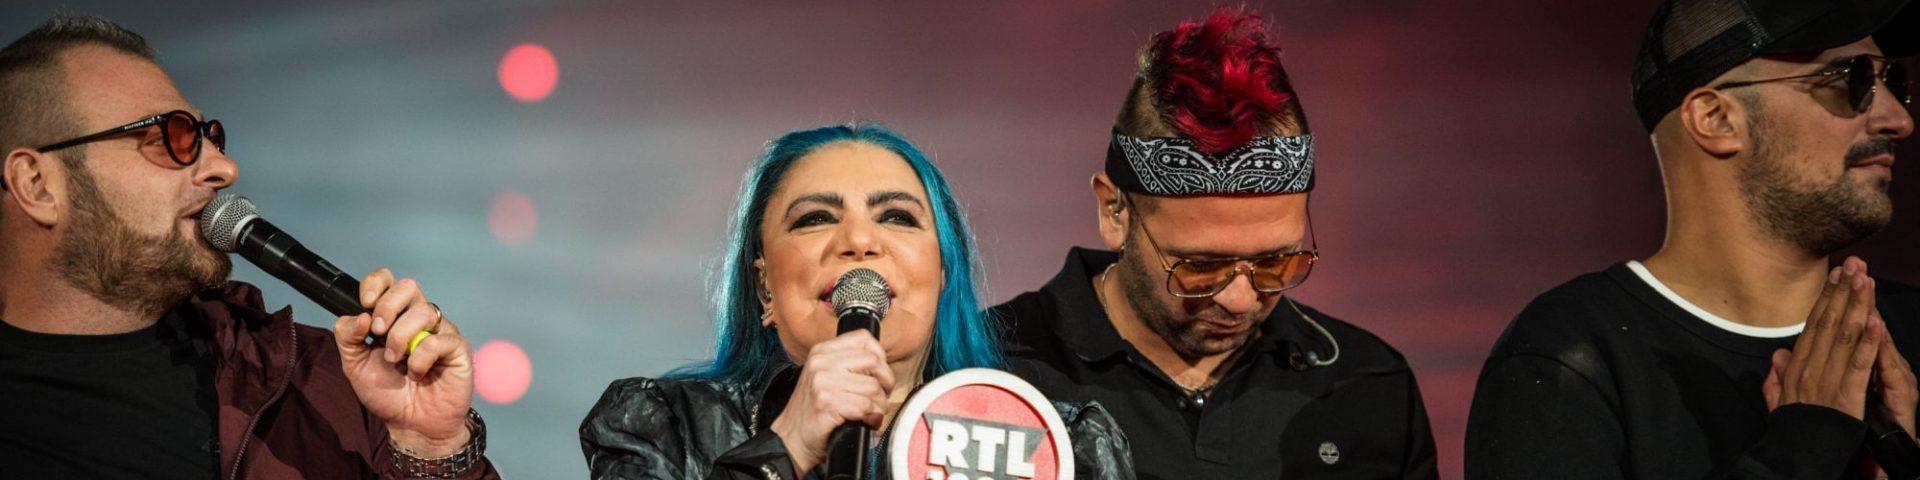 RTL 102.5 Power Hits Estate 2018: tutti i premi